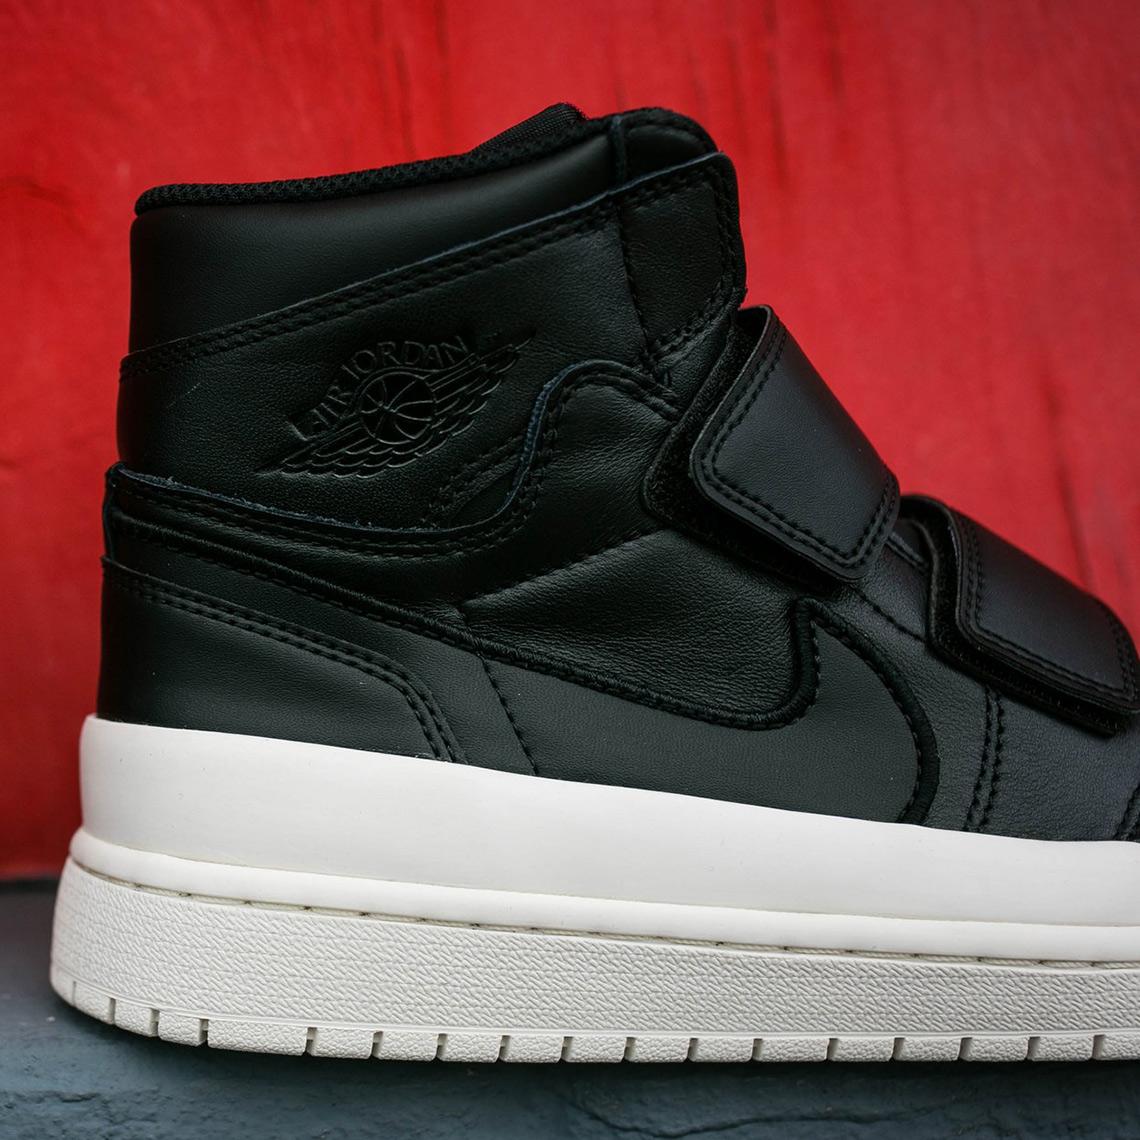 145f9011216 Air Jordan 1 Double Strap Black/Sail Buy Now | SneakerNews.com